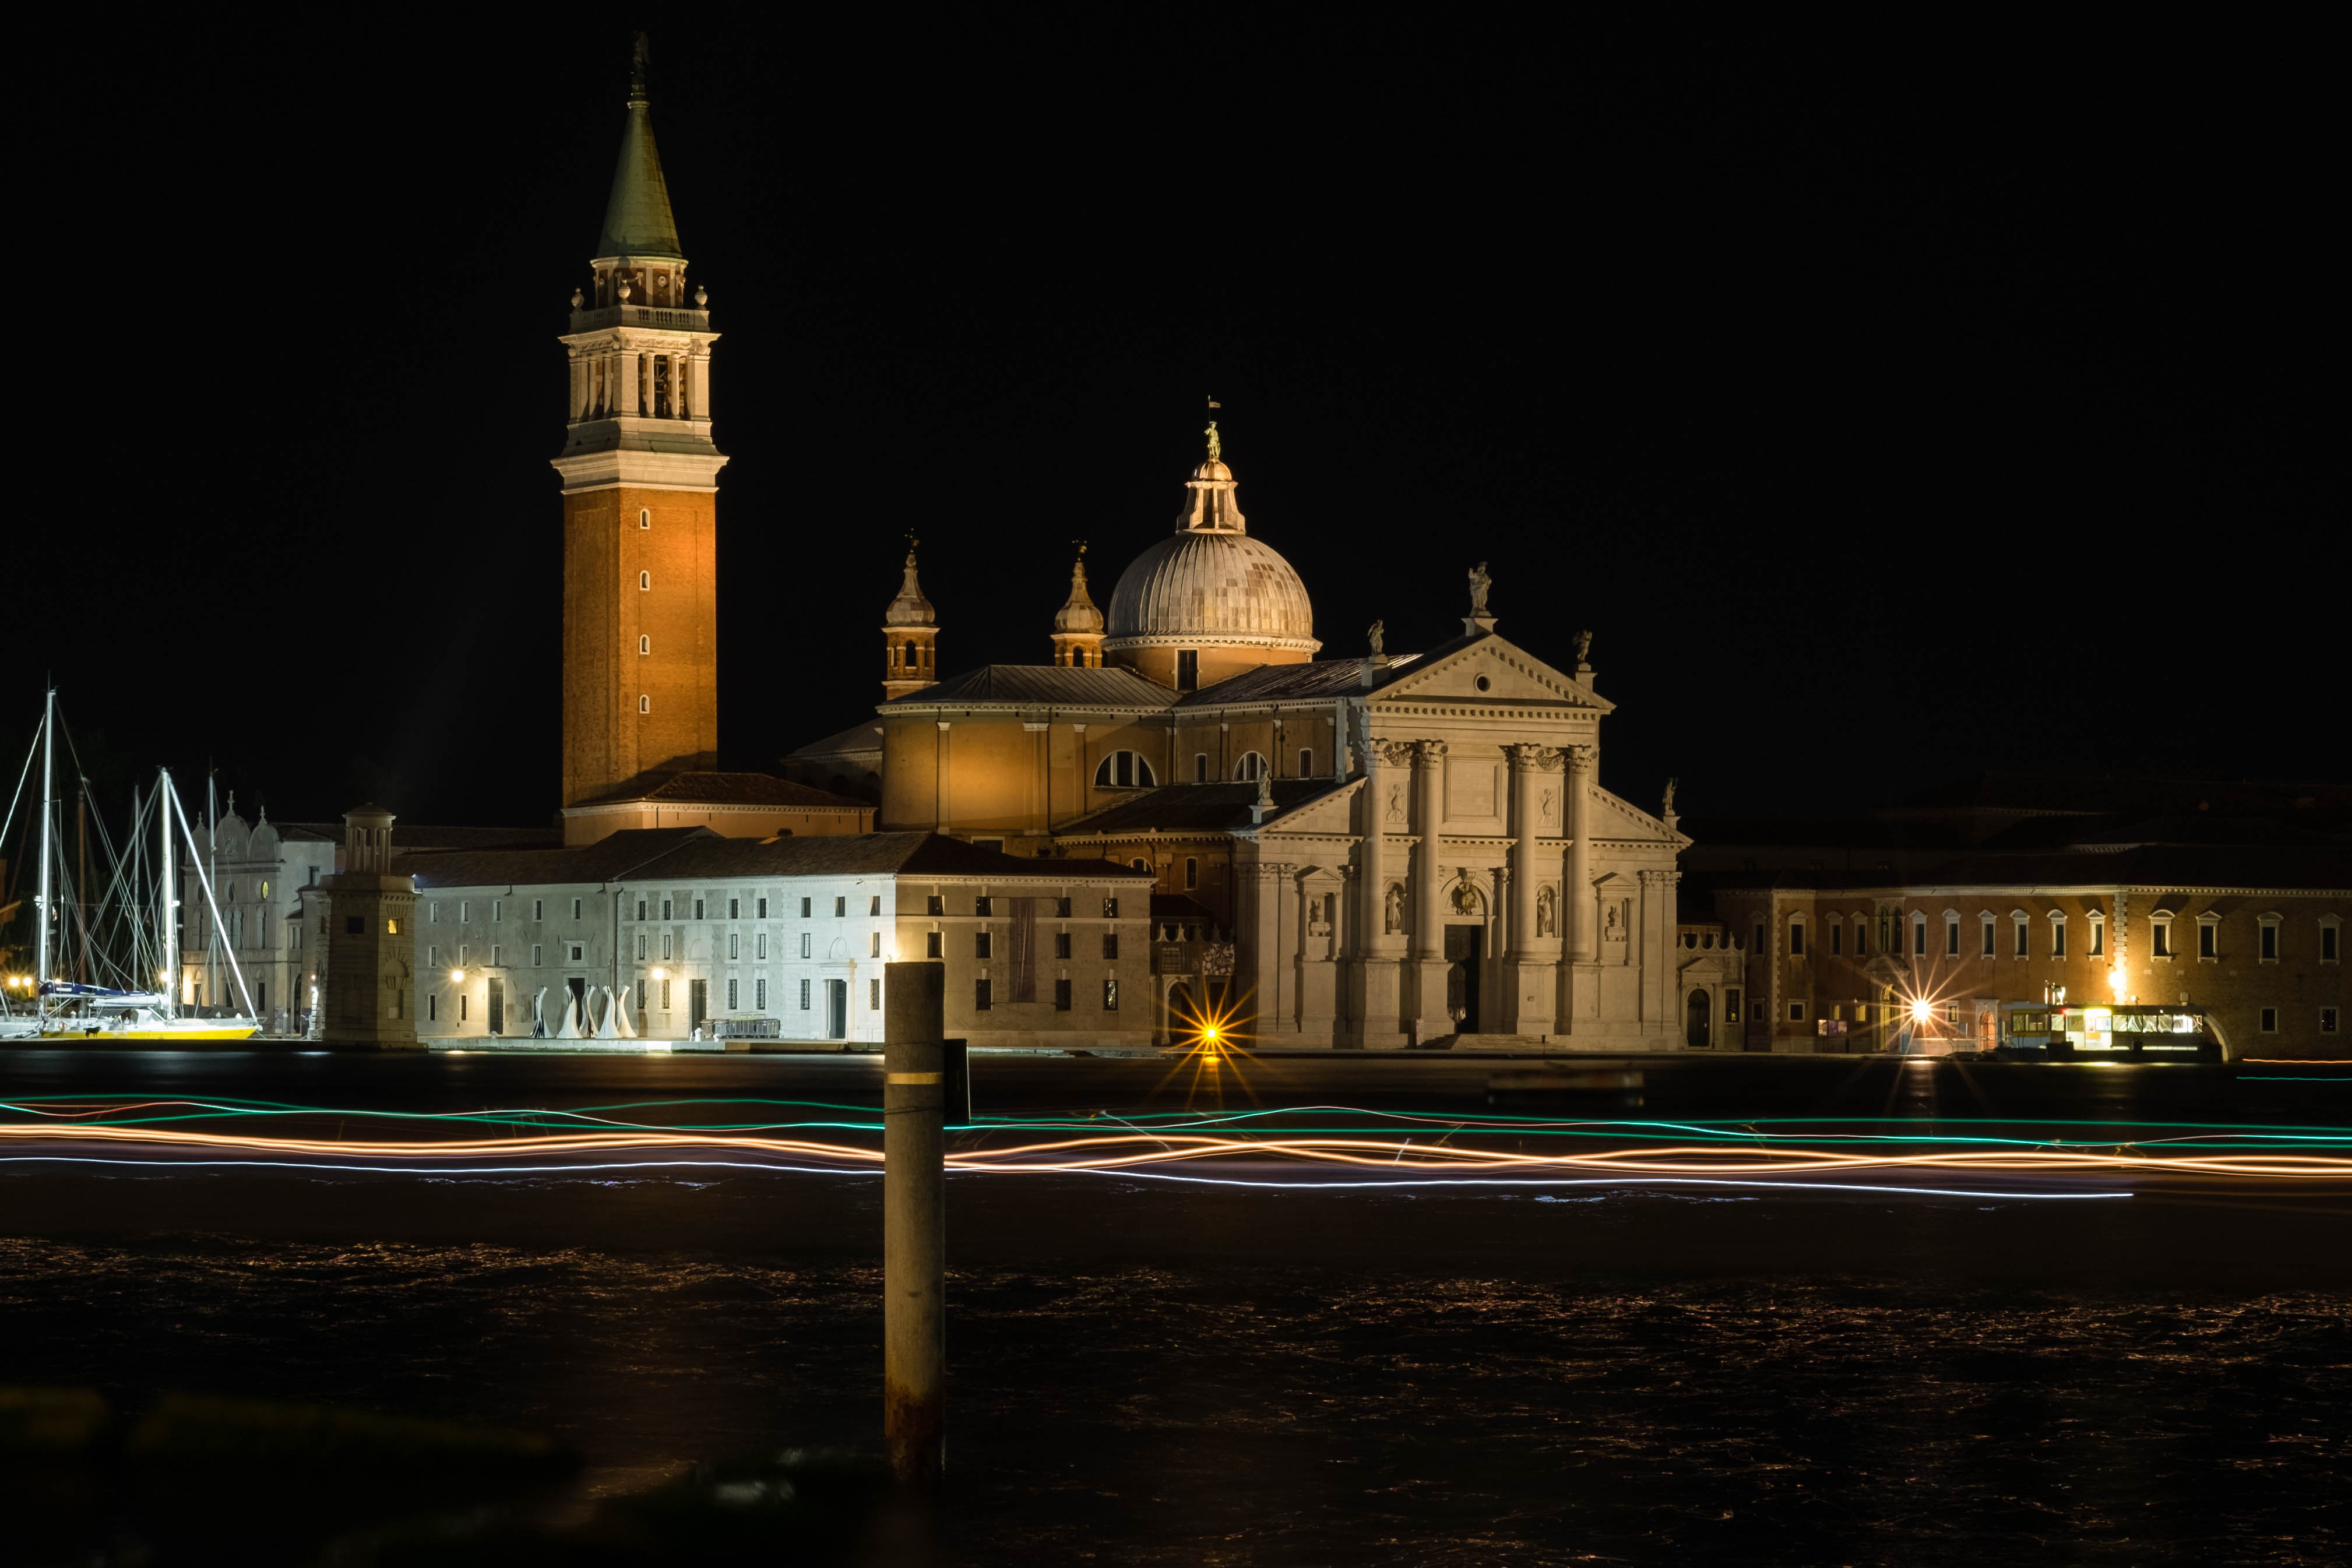 Cuordimela Venezia